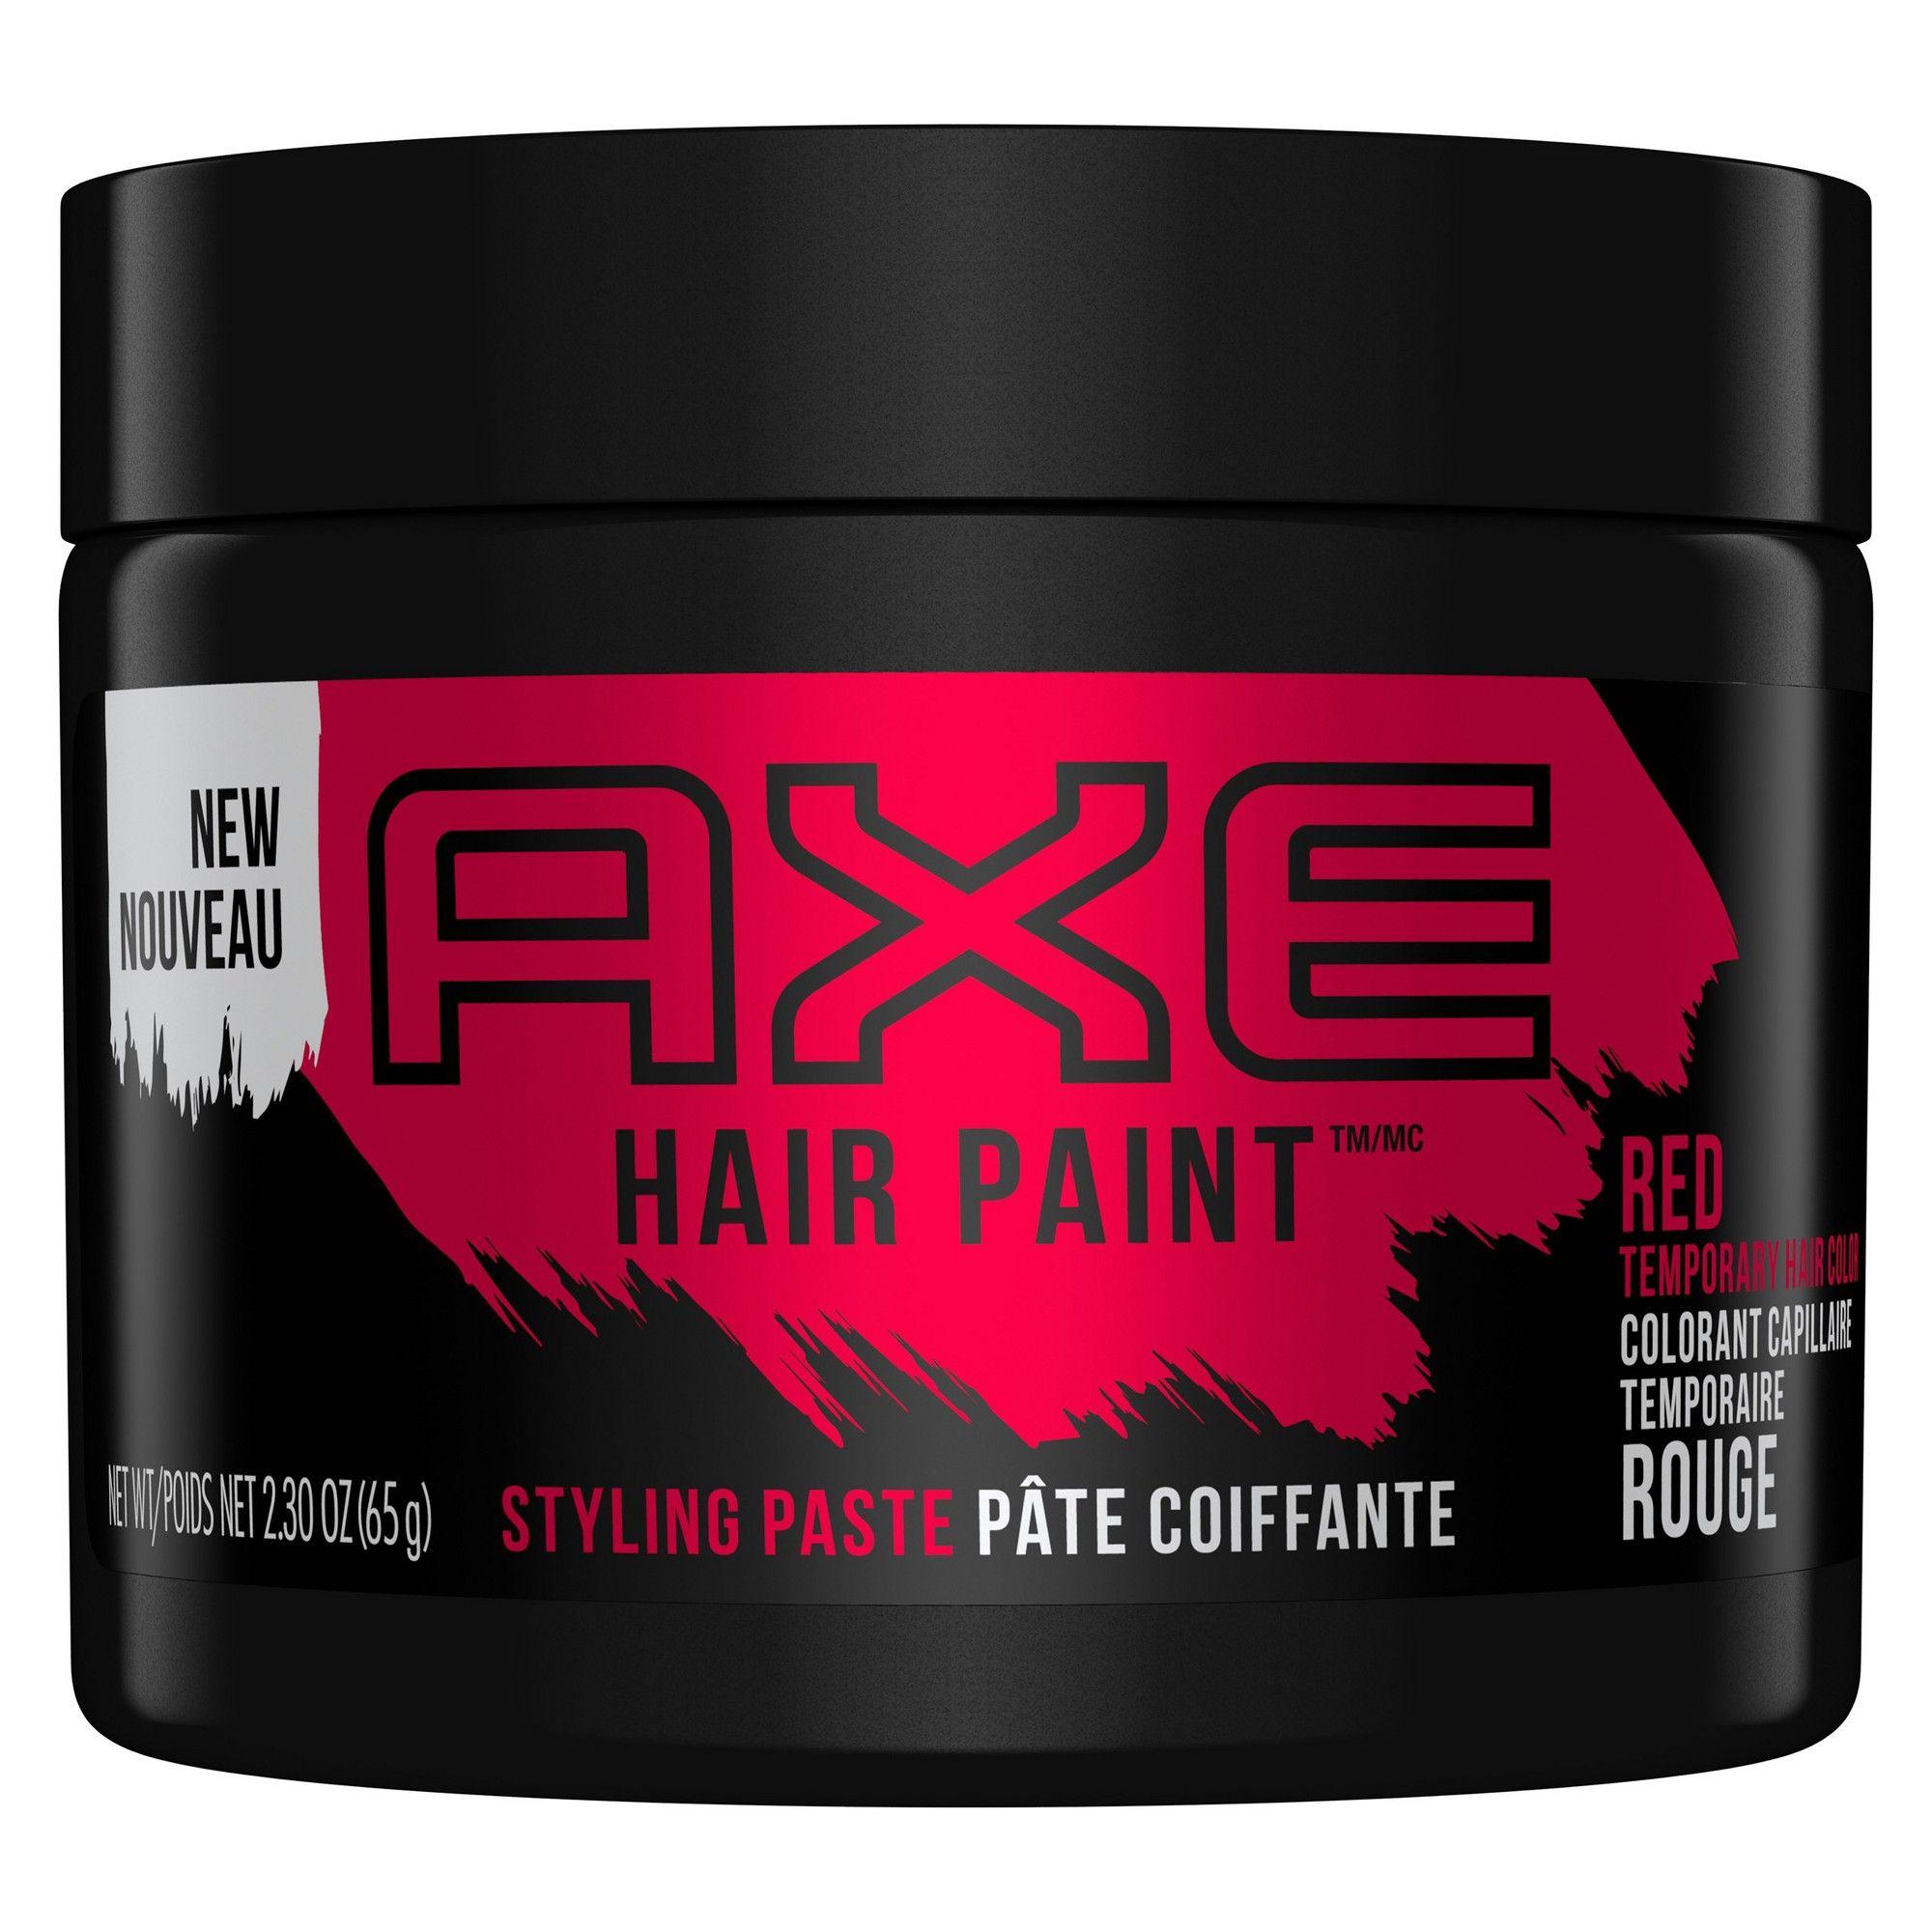 Axe Hair Paint Putty Red 2 3oz Axe Hair Products Hair Painting Hair Masque